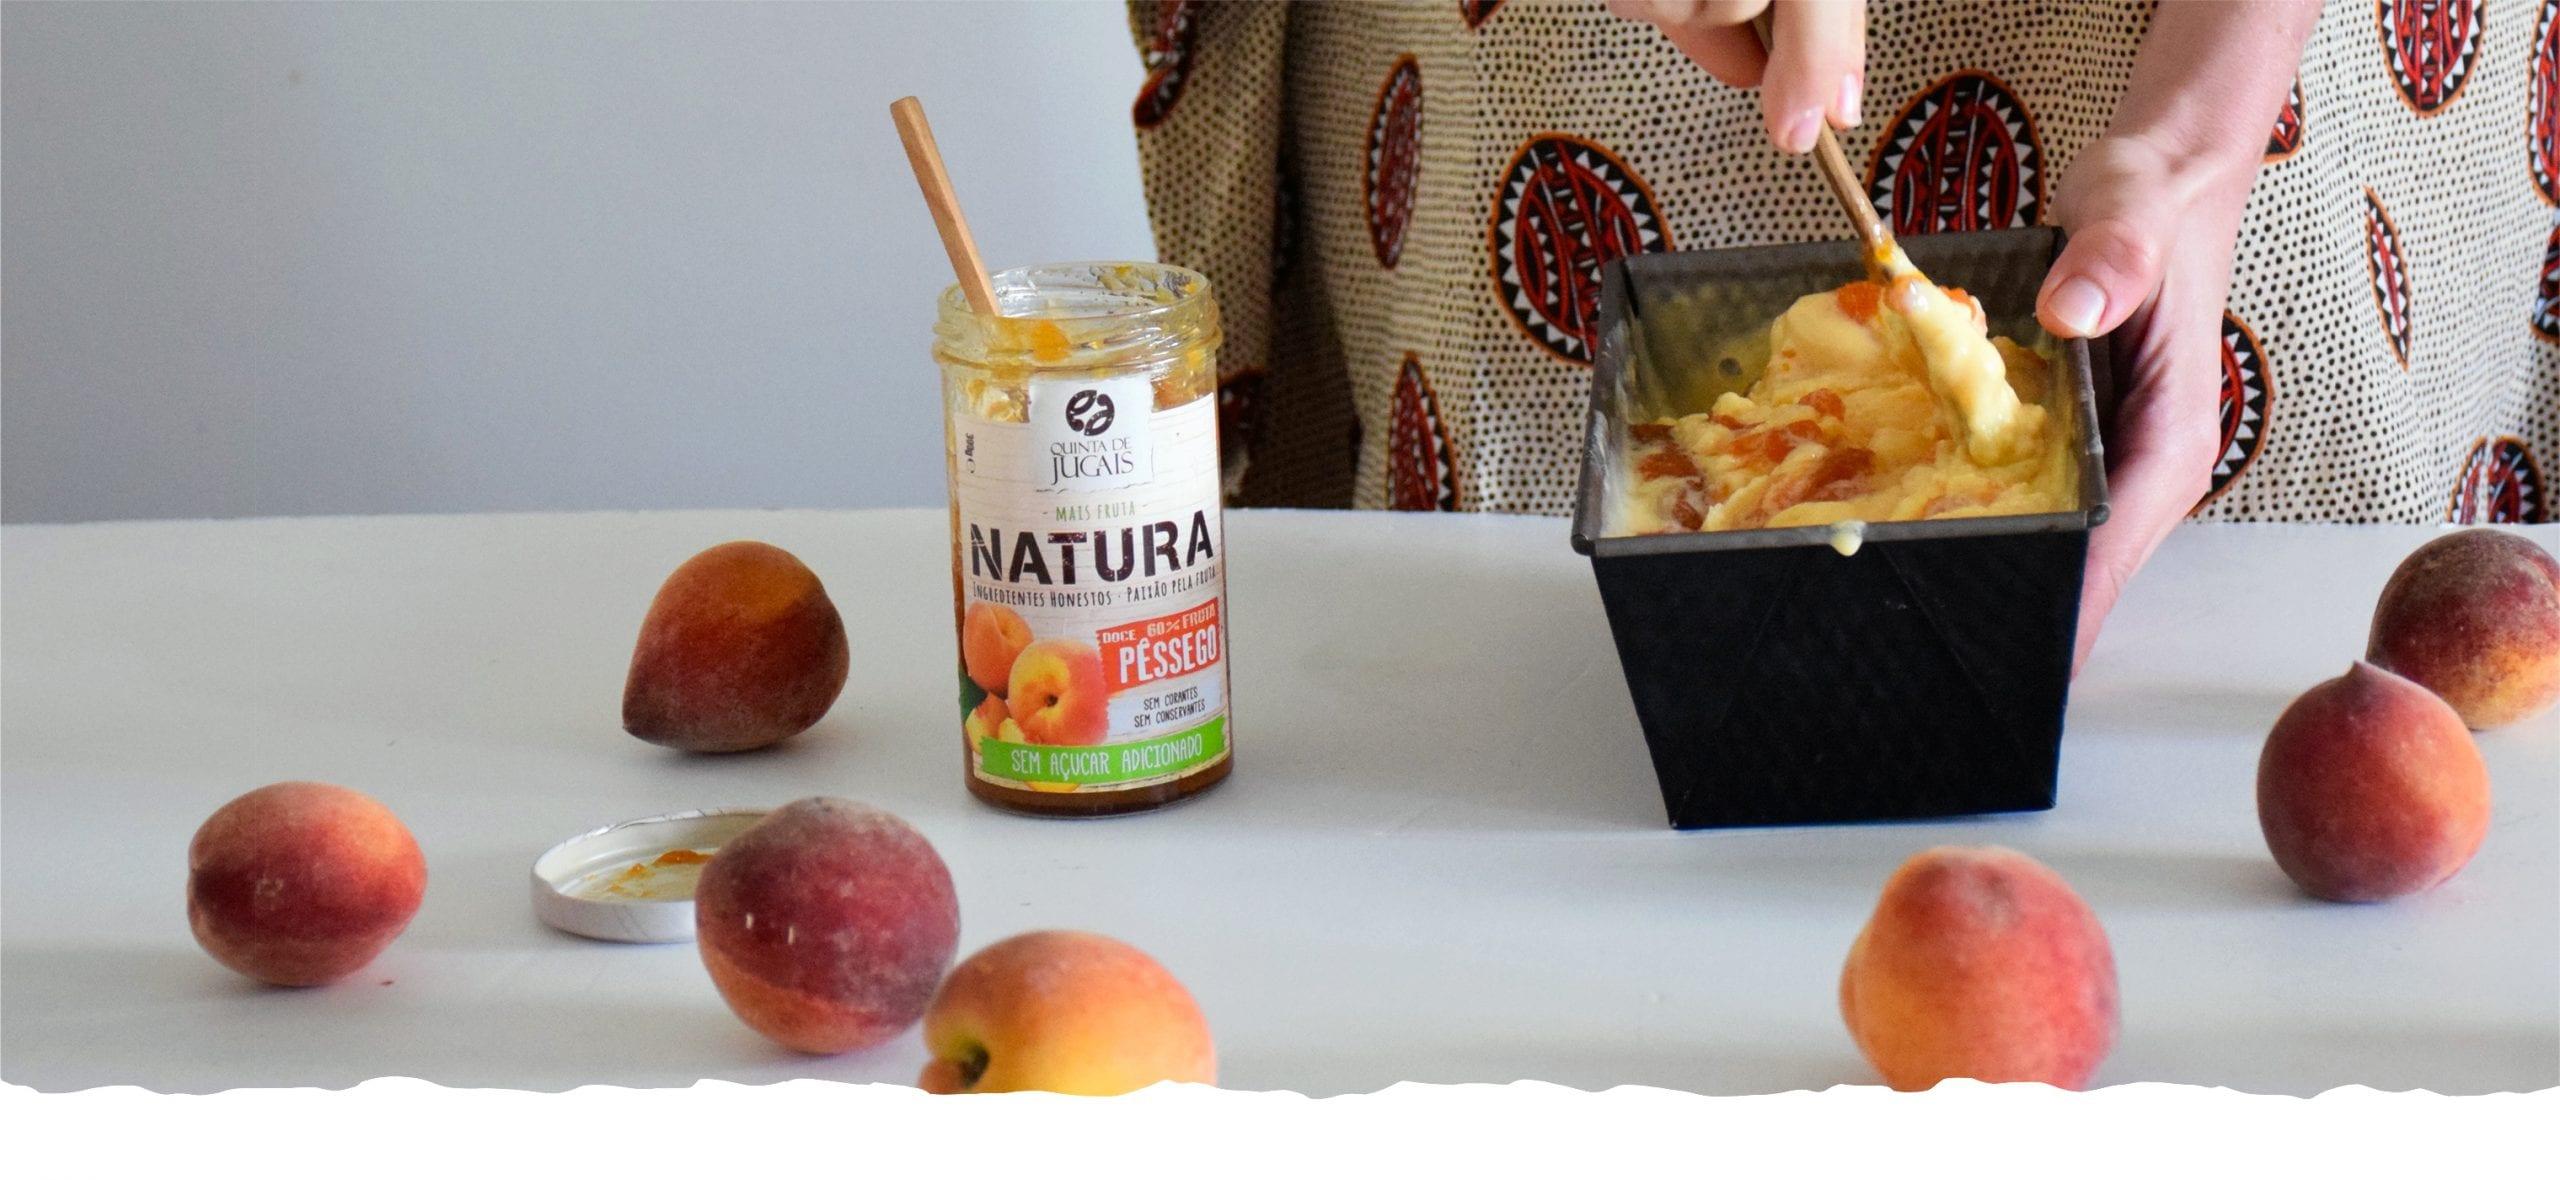 Healthy Ice Cream with Natura Peach Jam